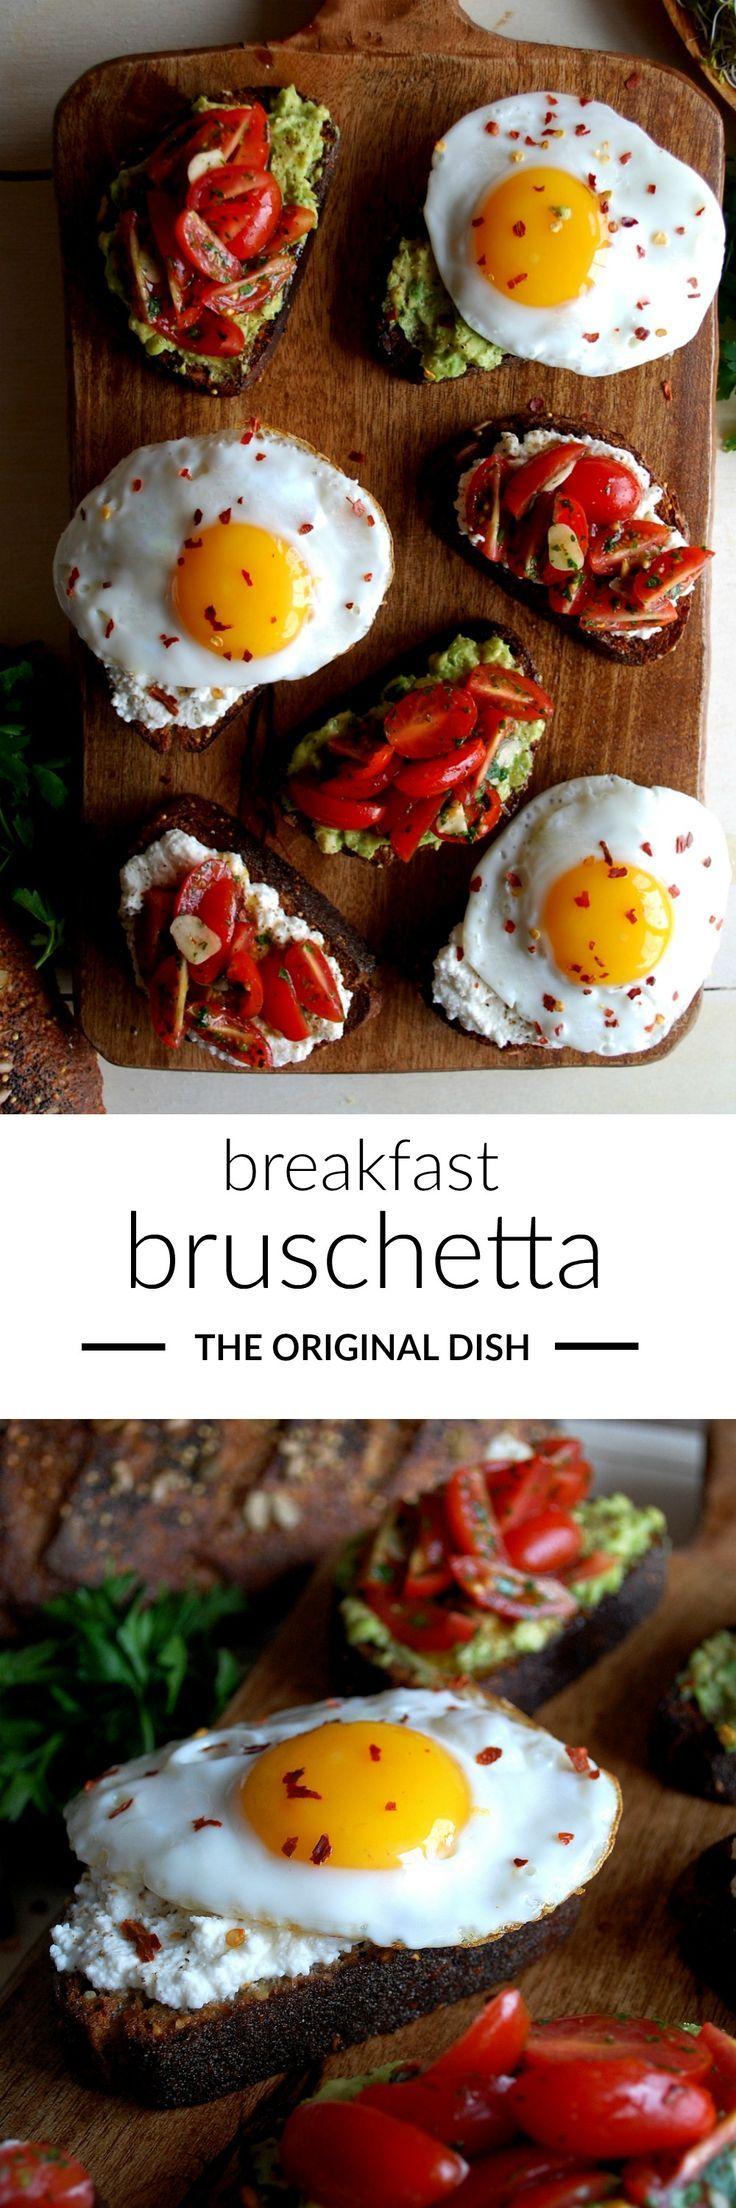 breakfast bruschetta...whole grain toast topped with smashed avocado, creamy ricotta, garlicky tomatoes & perfectly fried eggs - http://www.theoriginaldish.com